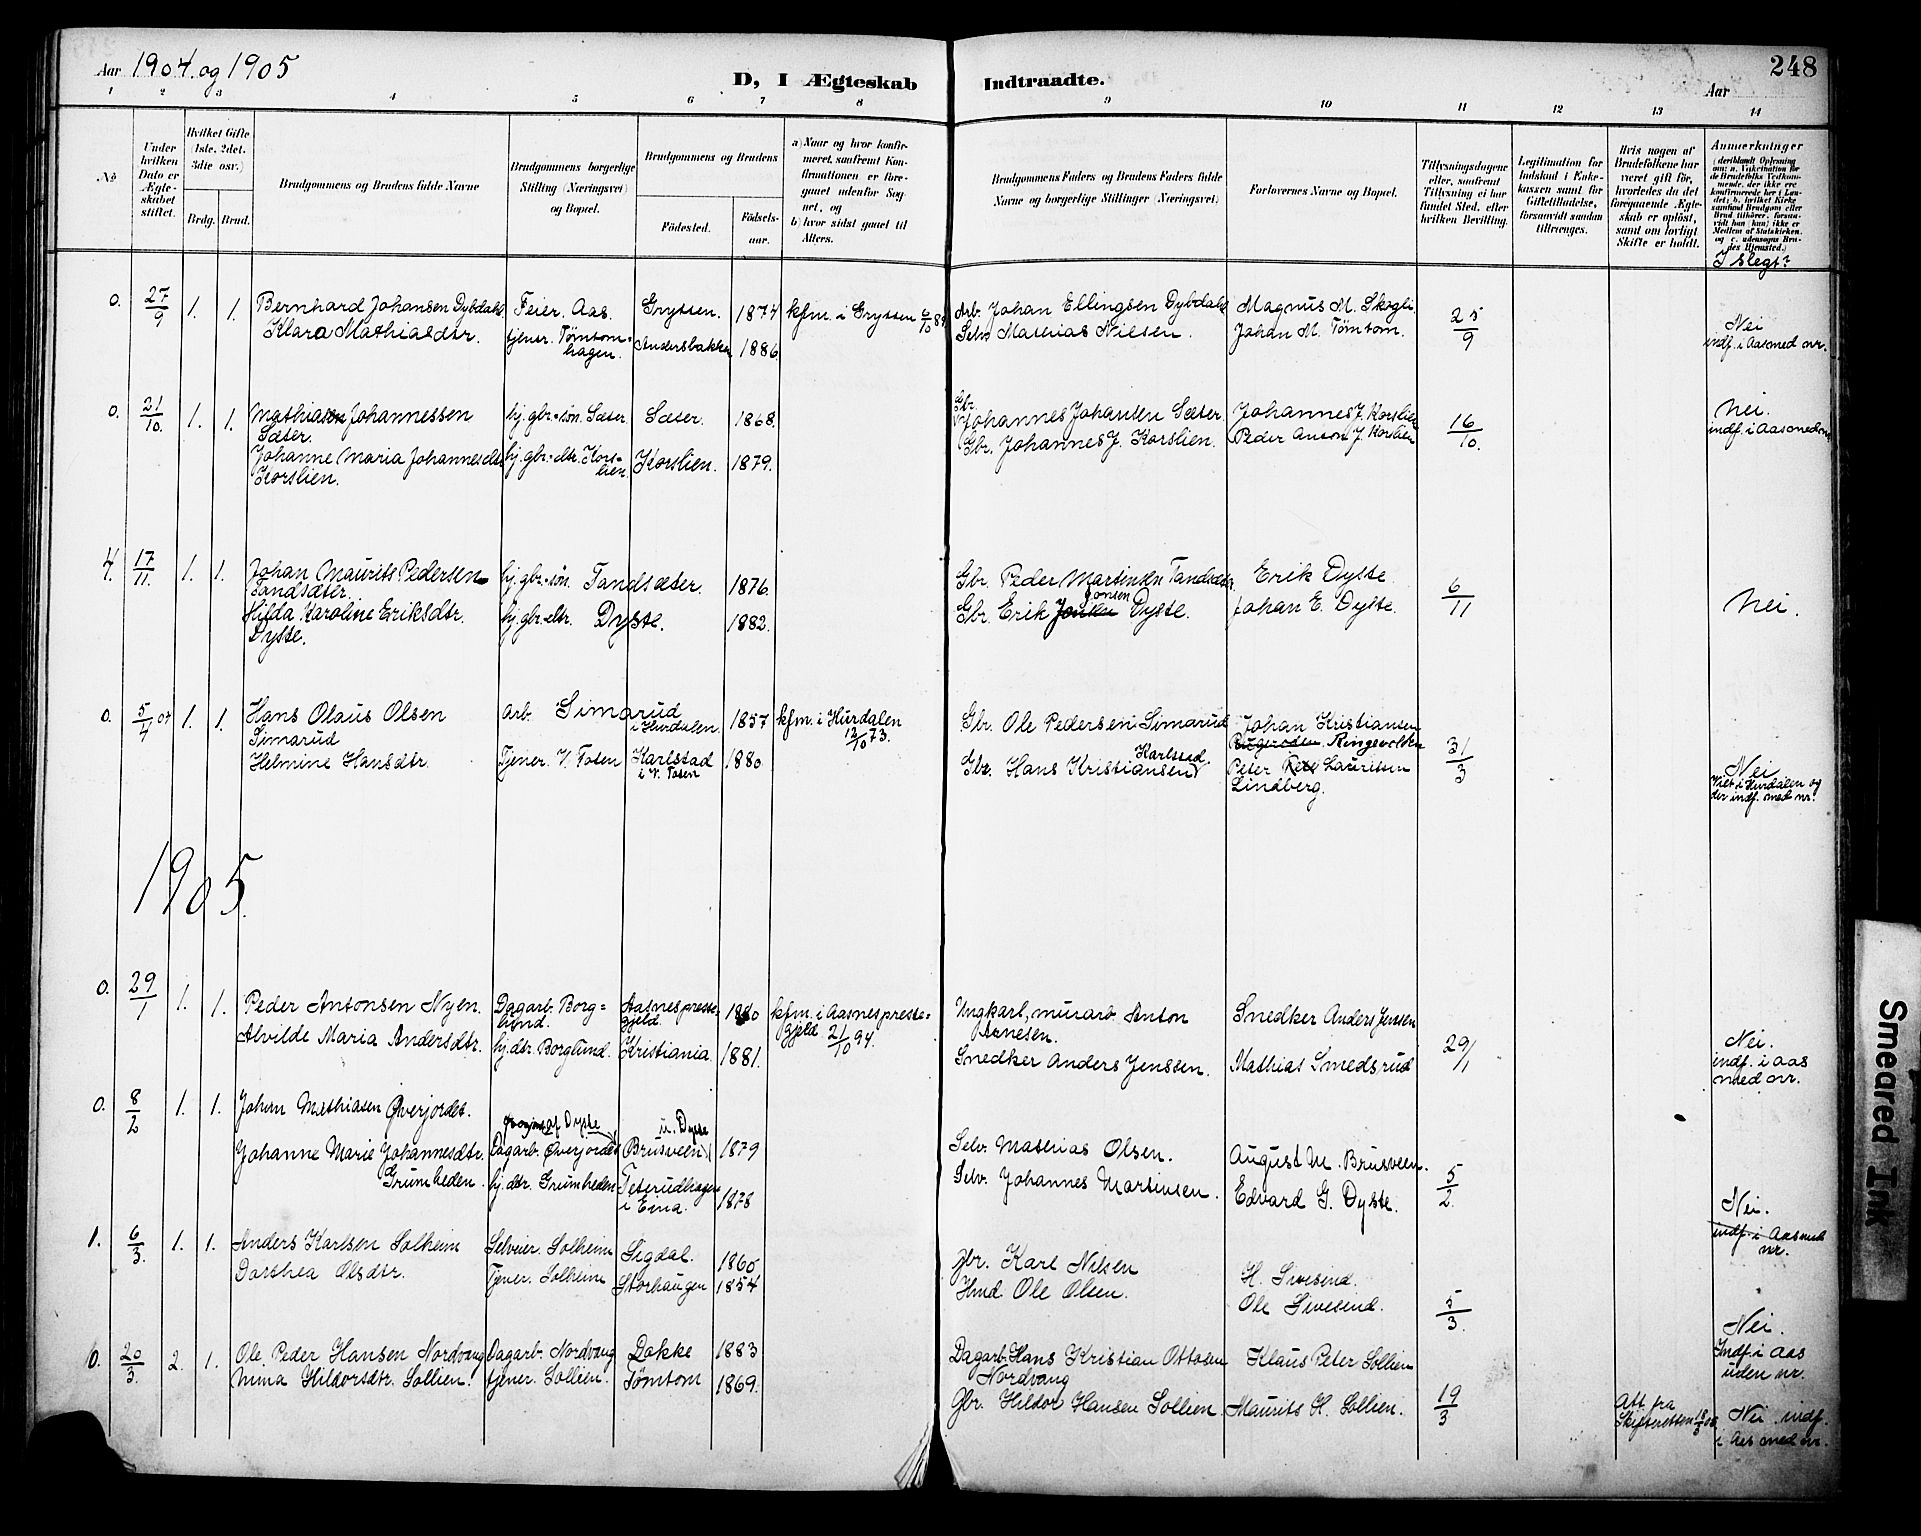 SAH, Vestre Toten prestekontor, H/Ha/Haa/L0013: Ministerialbok nr. 13, 1895-1911, s. 248